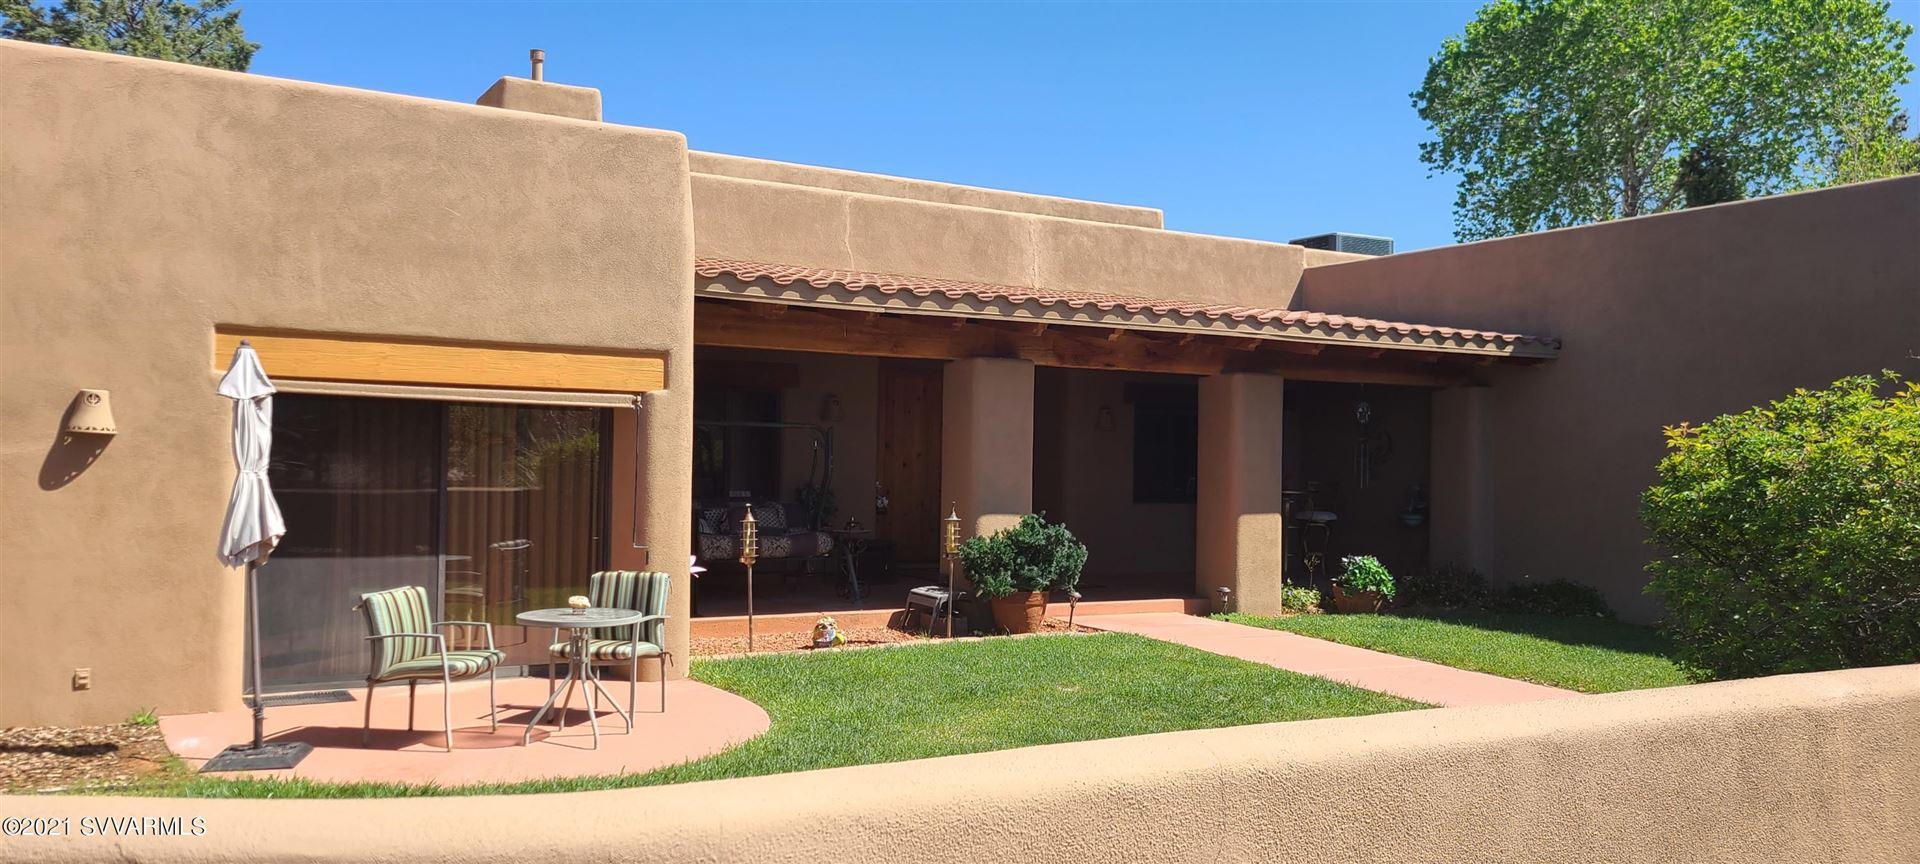 Photo of 161 Vista Mesa Drive, Sedona, AZ 86351 (MLS # 526123)